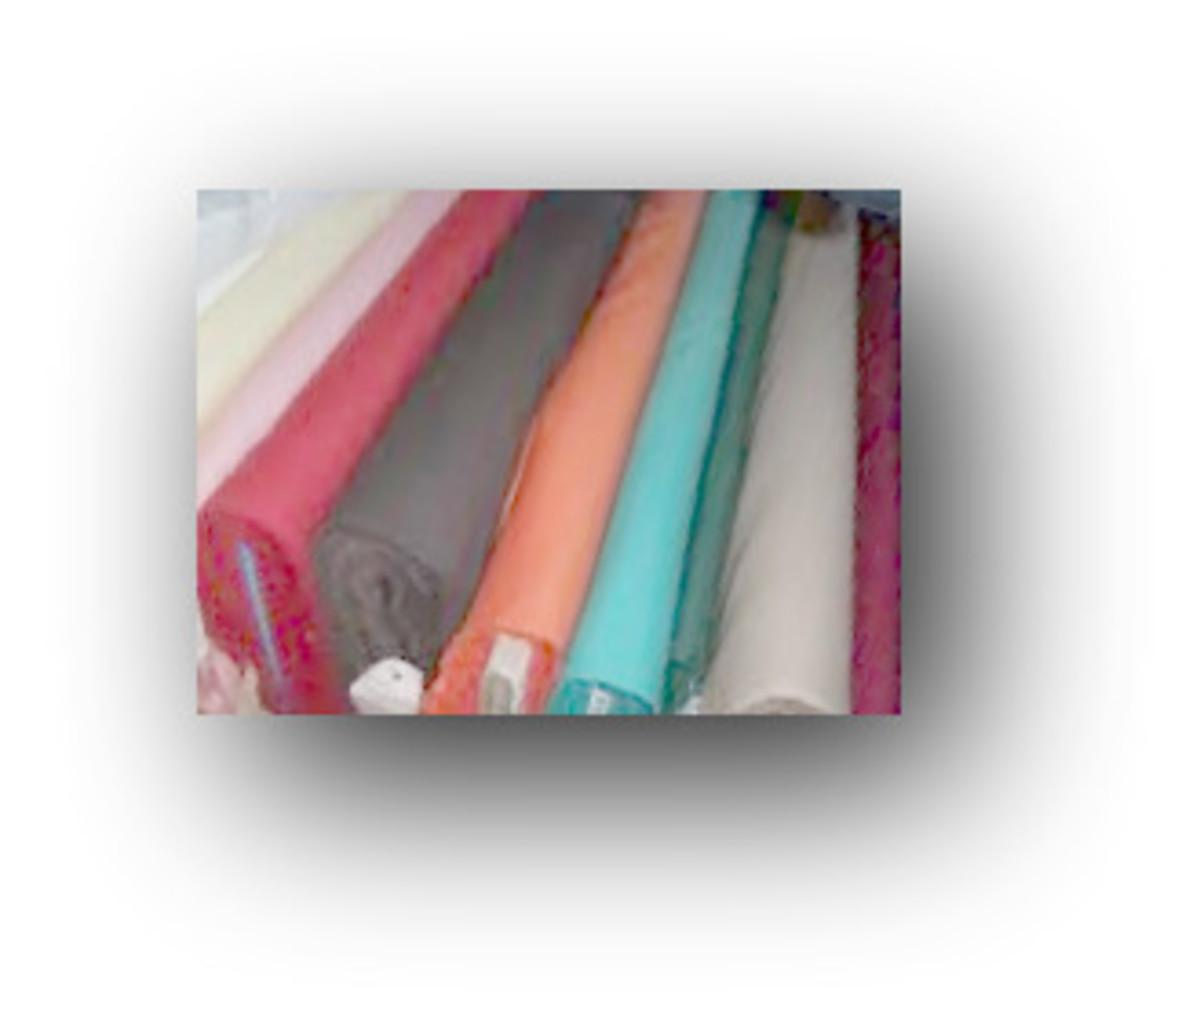 gabardine or twill weave